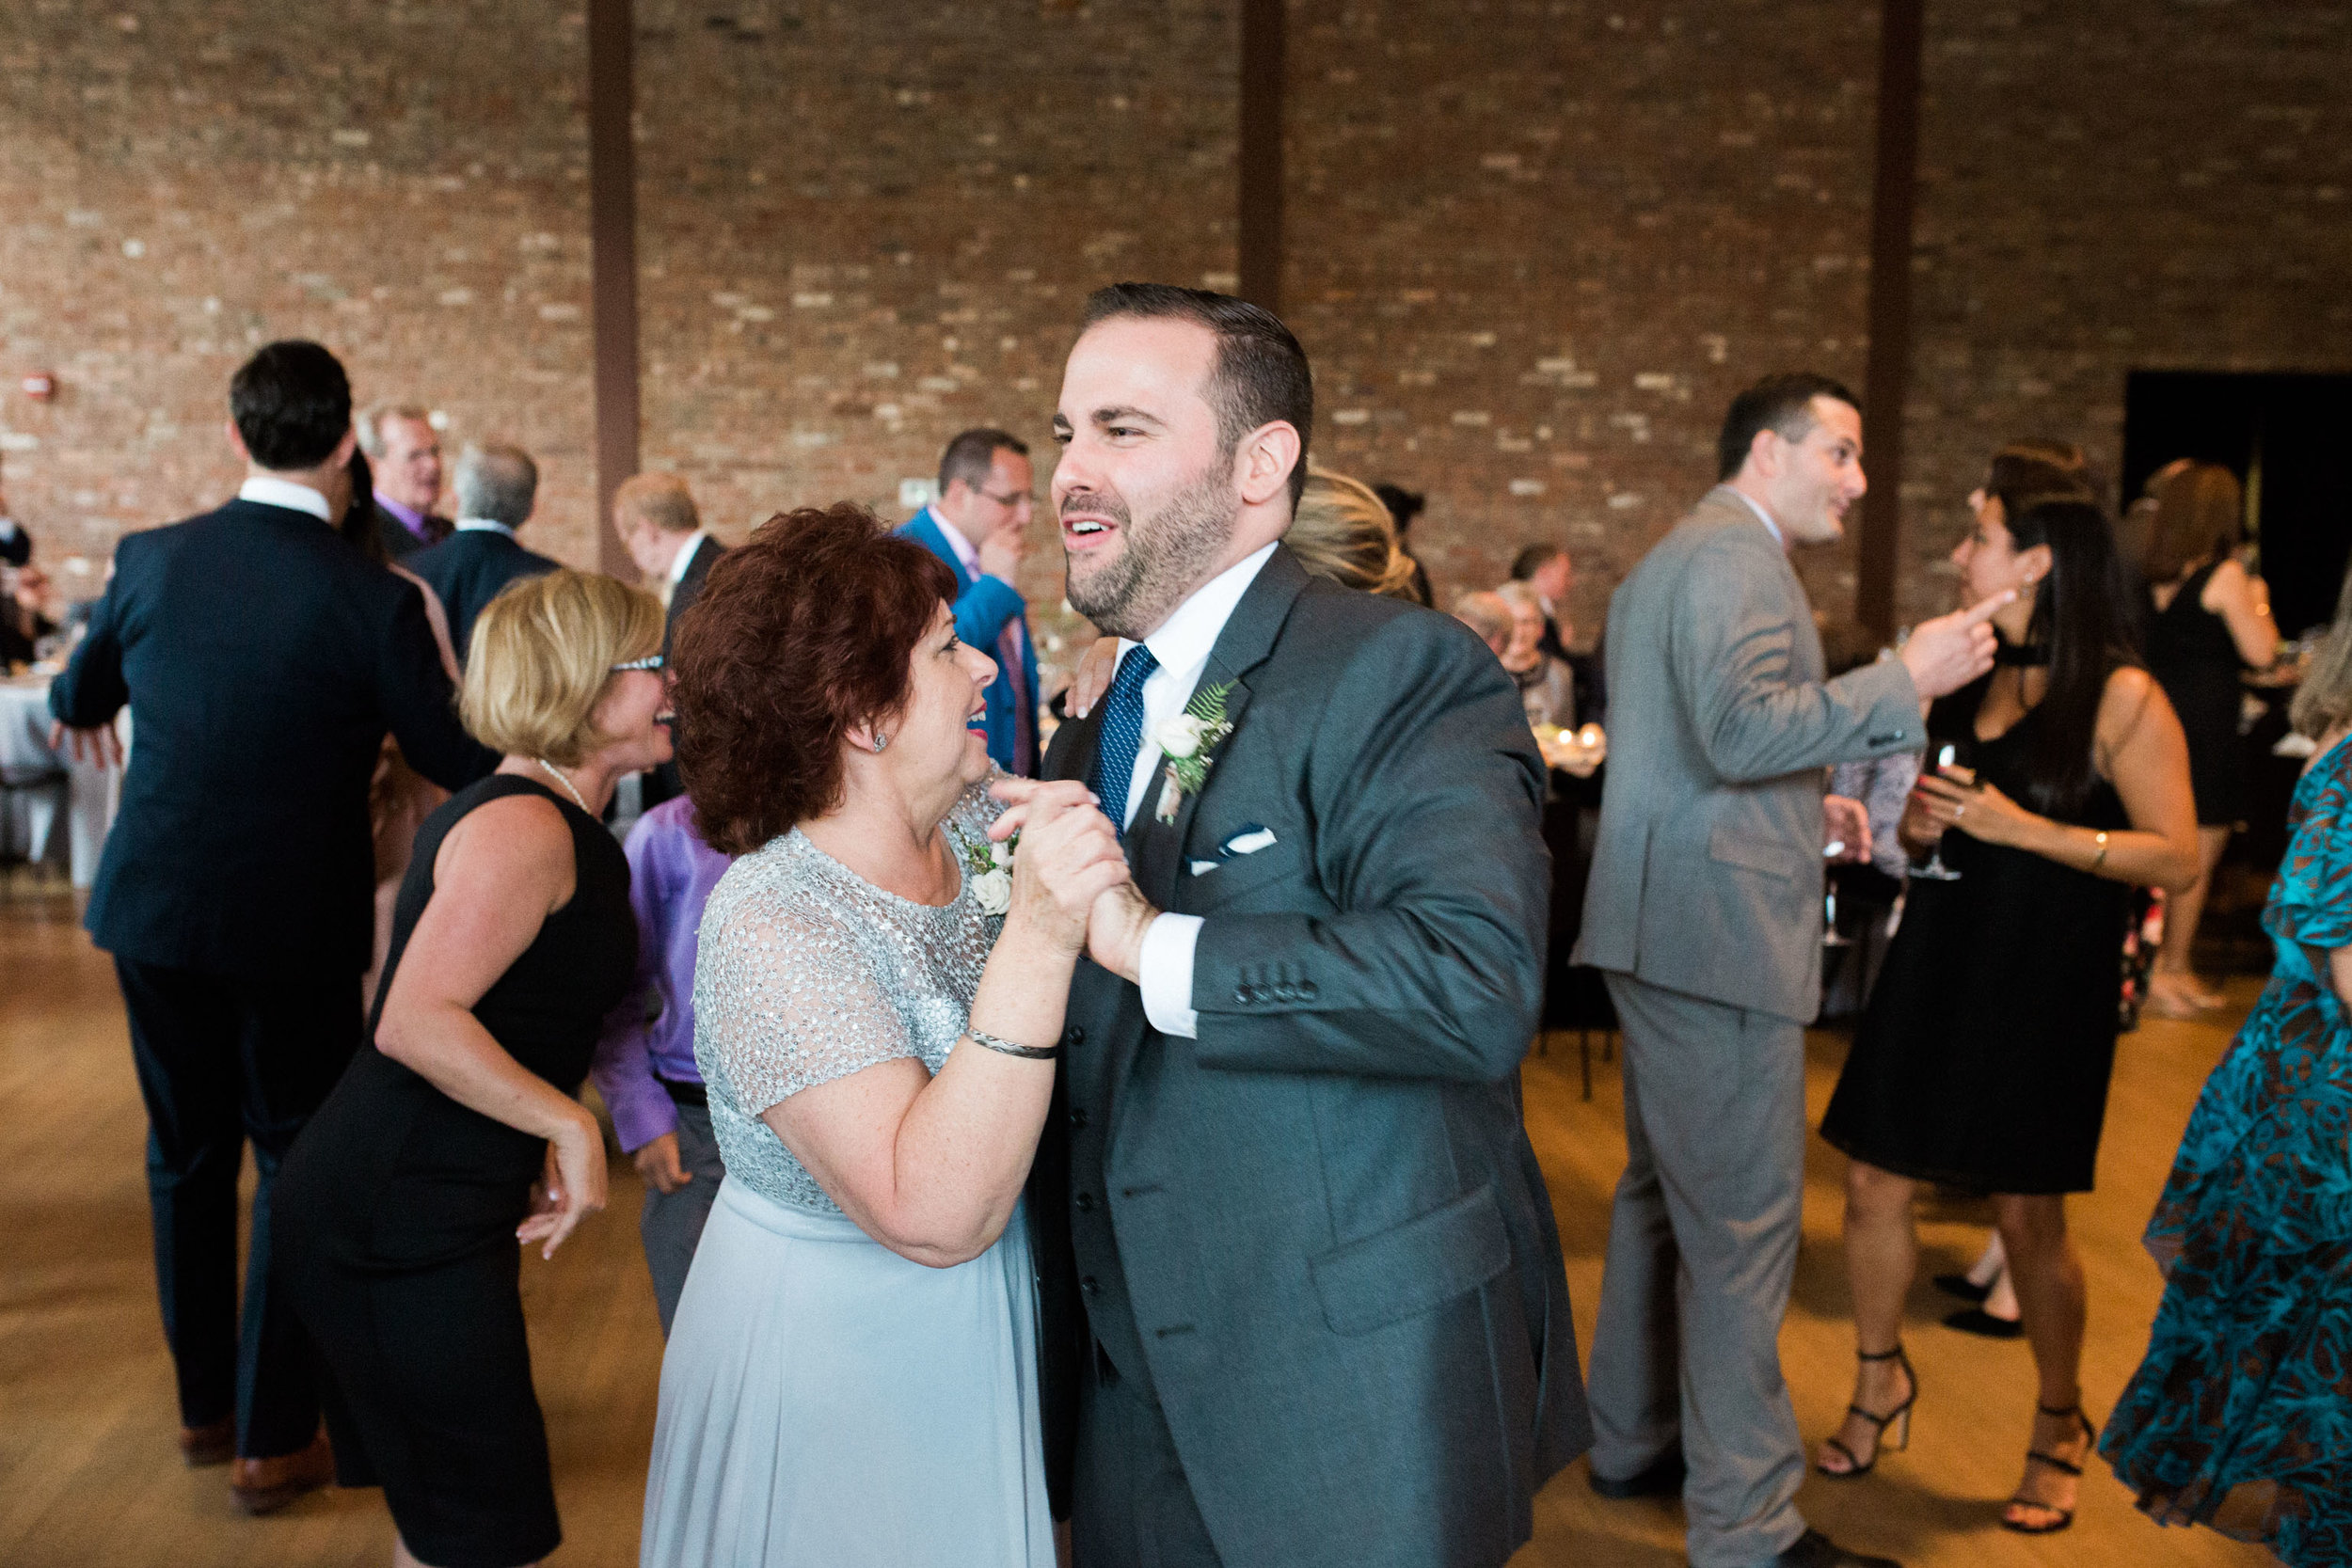 HiloandGinger-Brian+Dina_Weddingday_SneakPeek-55.jpg